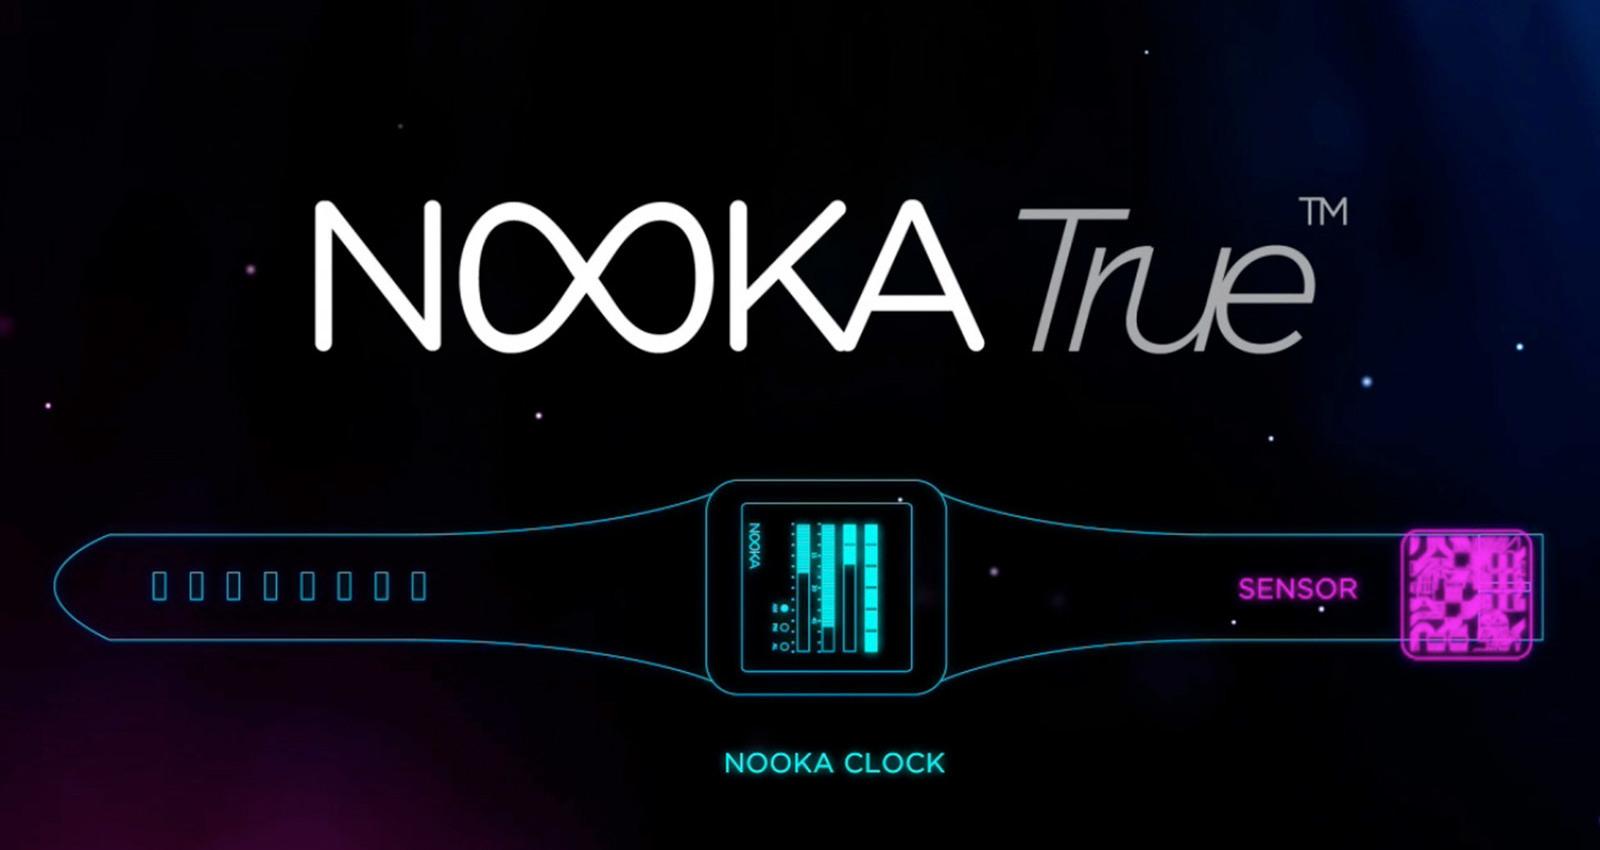 NOOKA TRUE